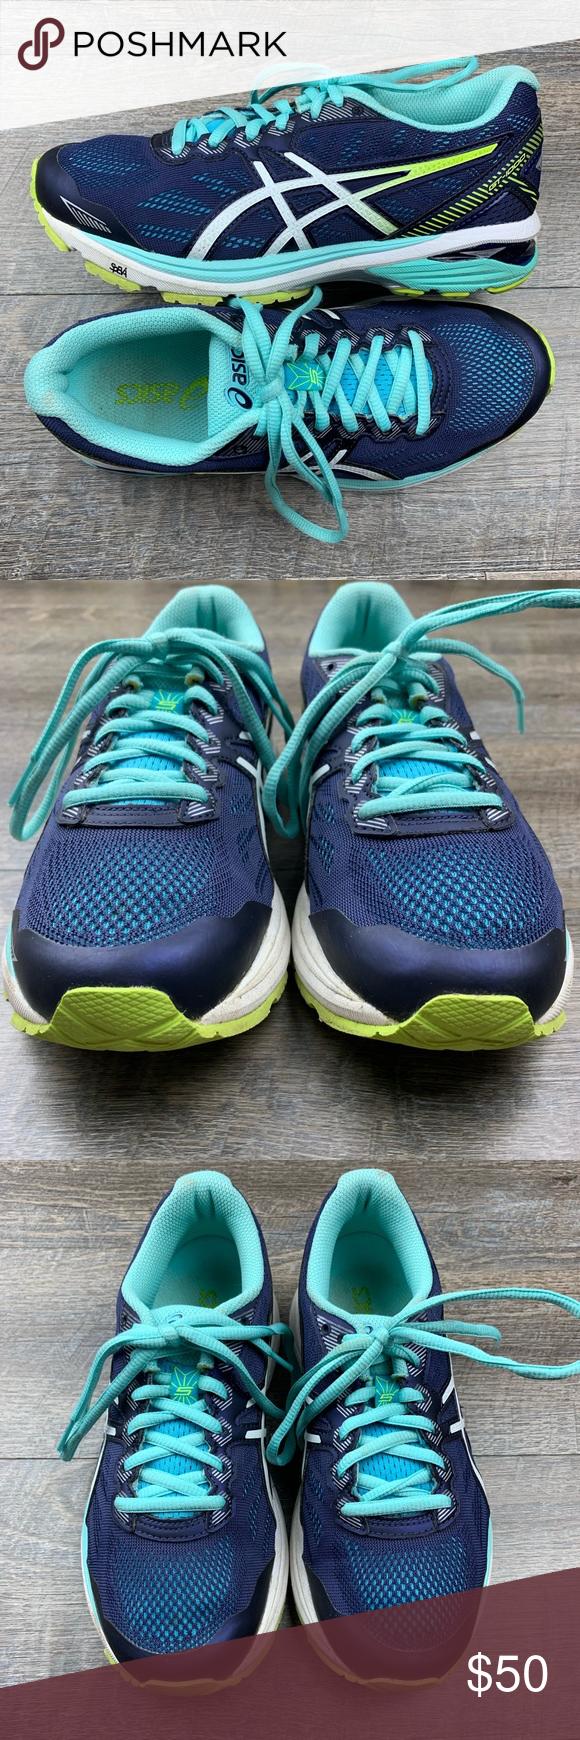 ASICS GT 1000 5 Indigo Blue Running Shoe Size 6 ASICS Womens